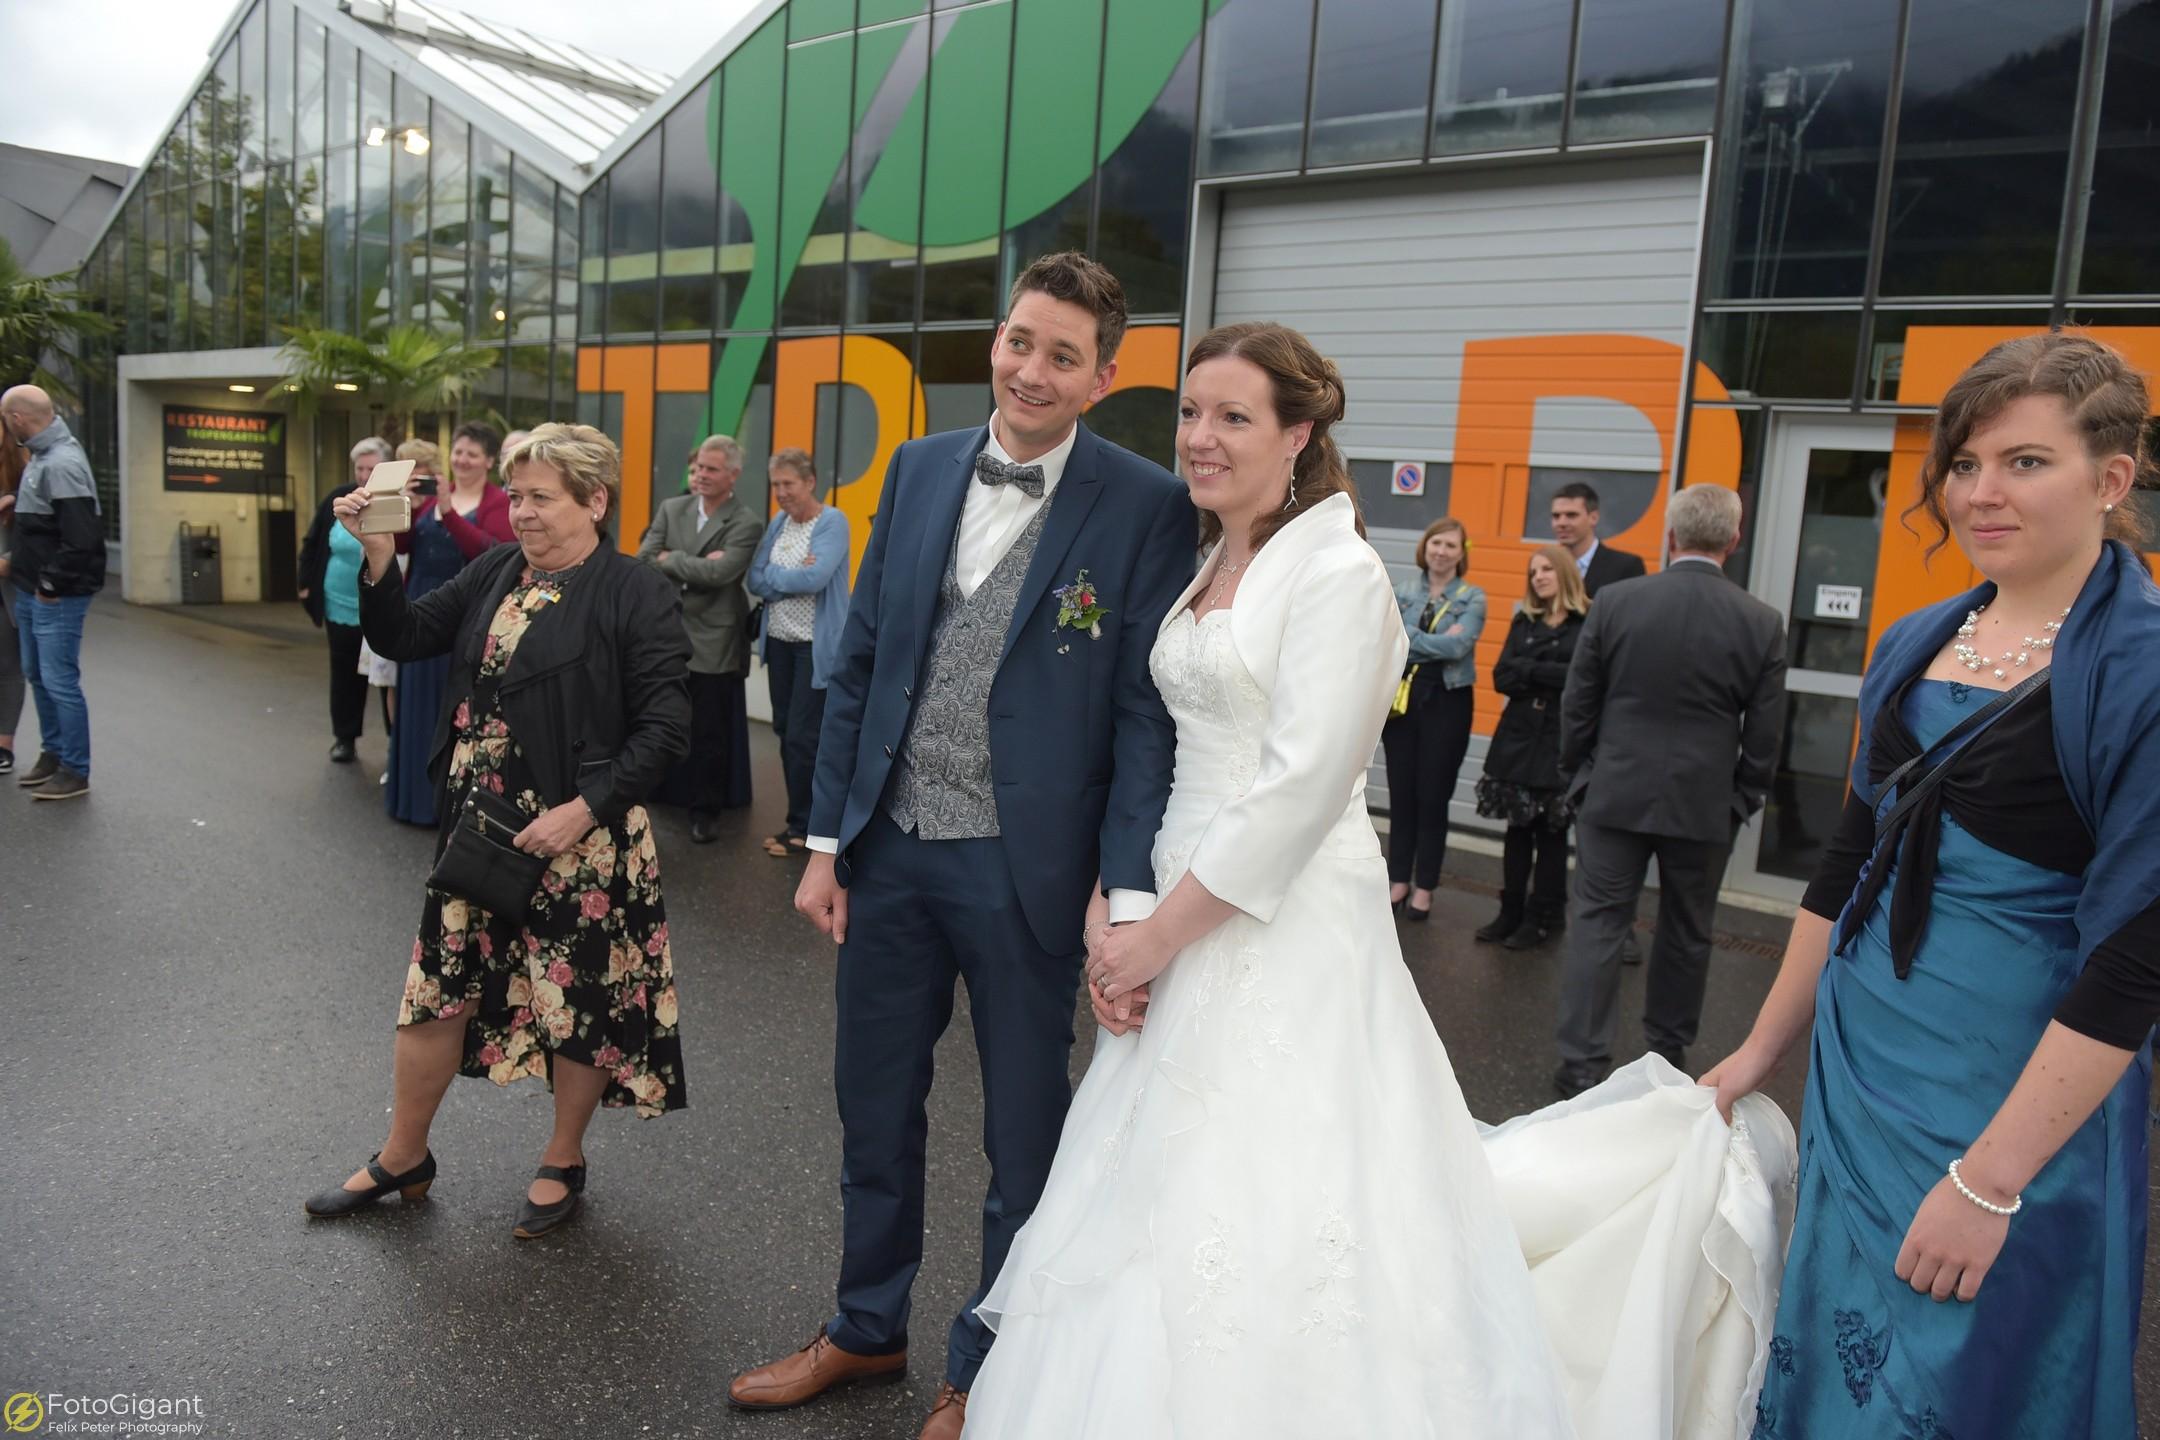 Hochzeitsfotograf_Frutigen_Bern_21.jpg